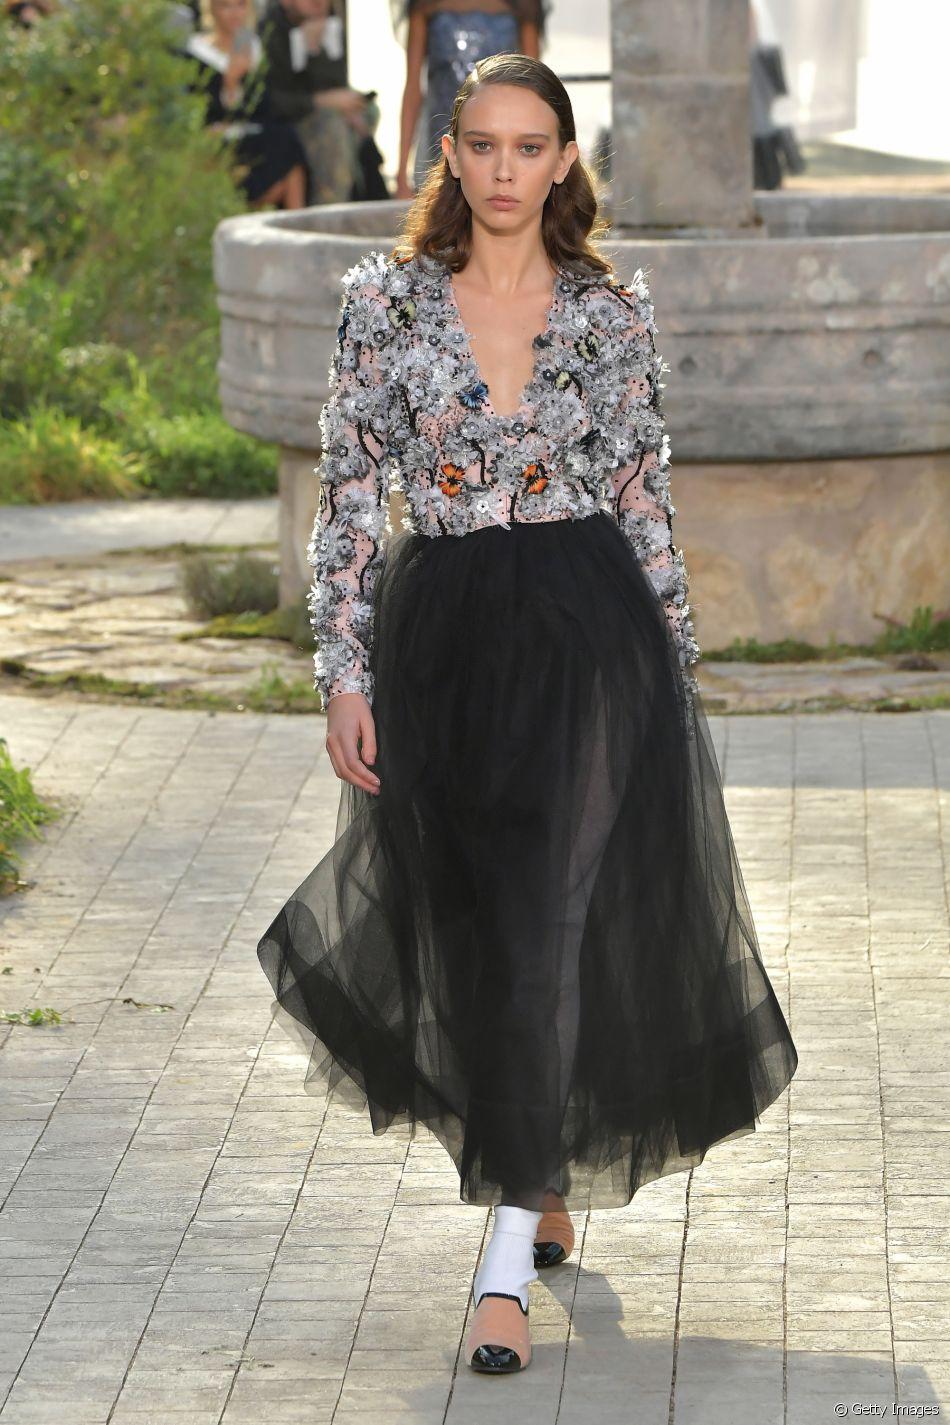 Desfile Chanel de alta-costura: tulê garante toque estiloso